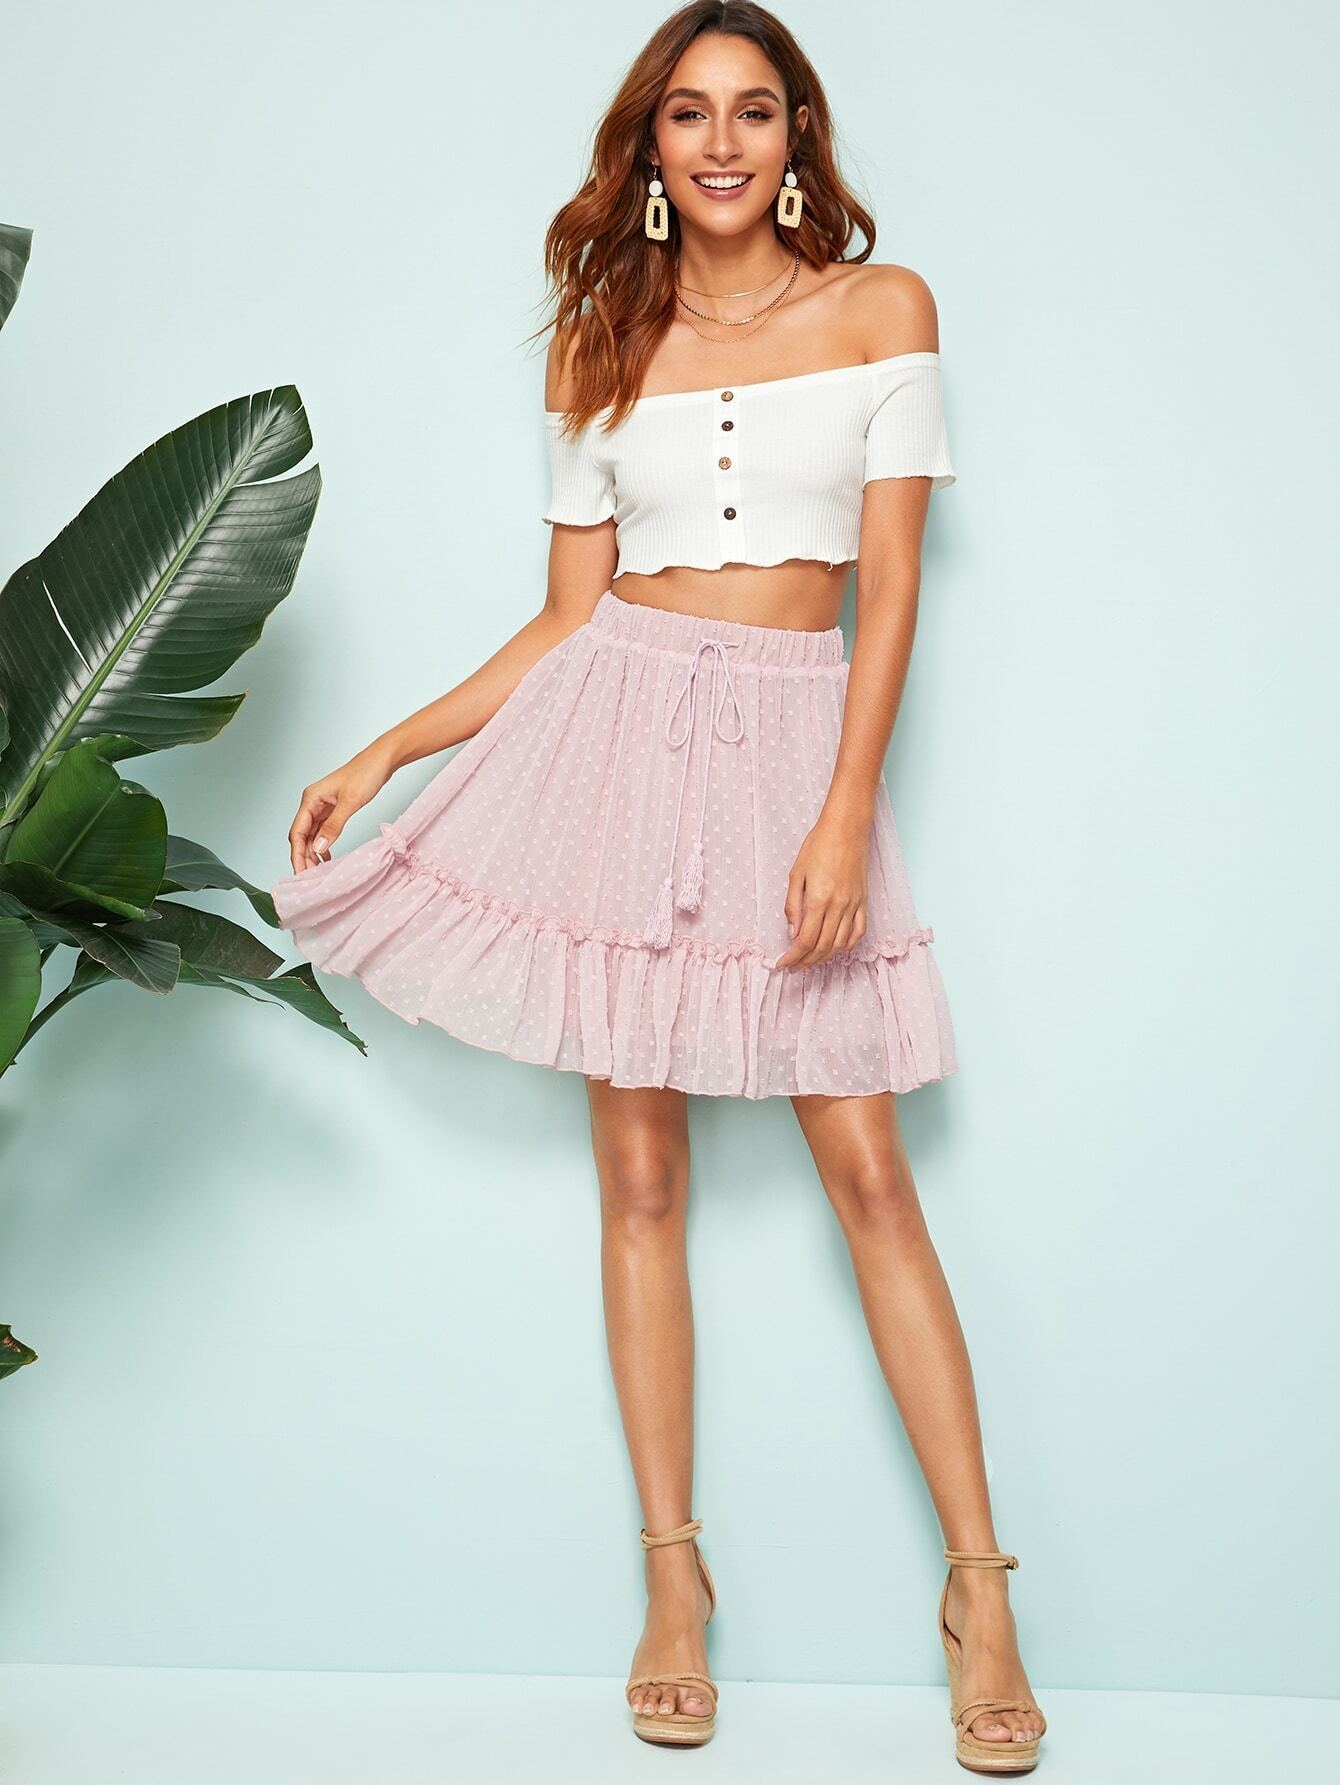 bf41ea9ccc Tassel Drawstring Waist Frill Trim Swiss Dot Skirt, Gabi B - shein ...